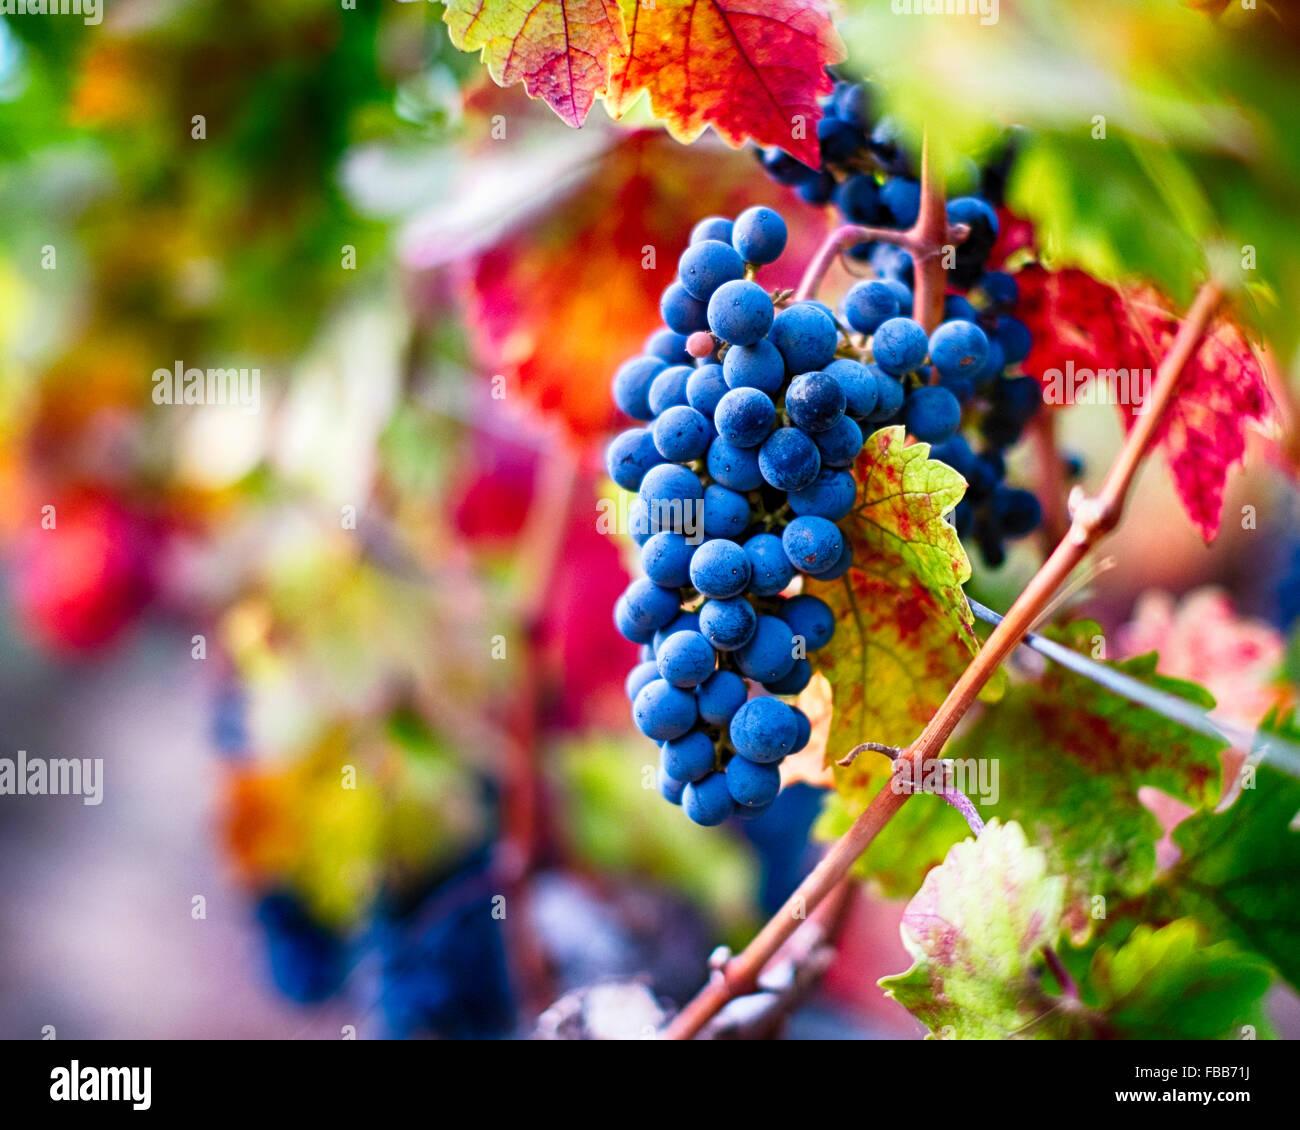 Blick auf Reife blauen Traube am Weinstock, Oakville, Napa Valley, Kalifornien Stockbild